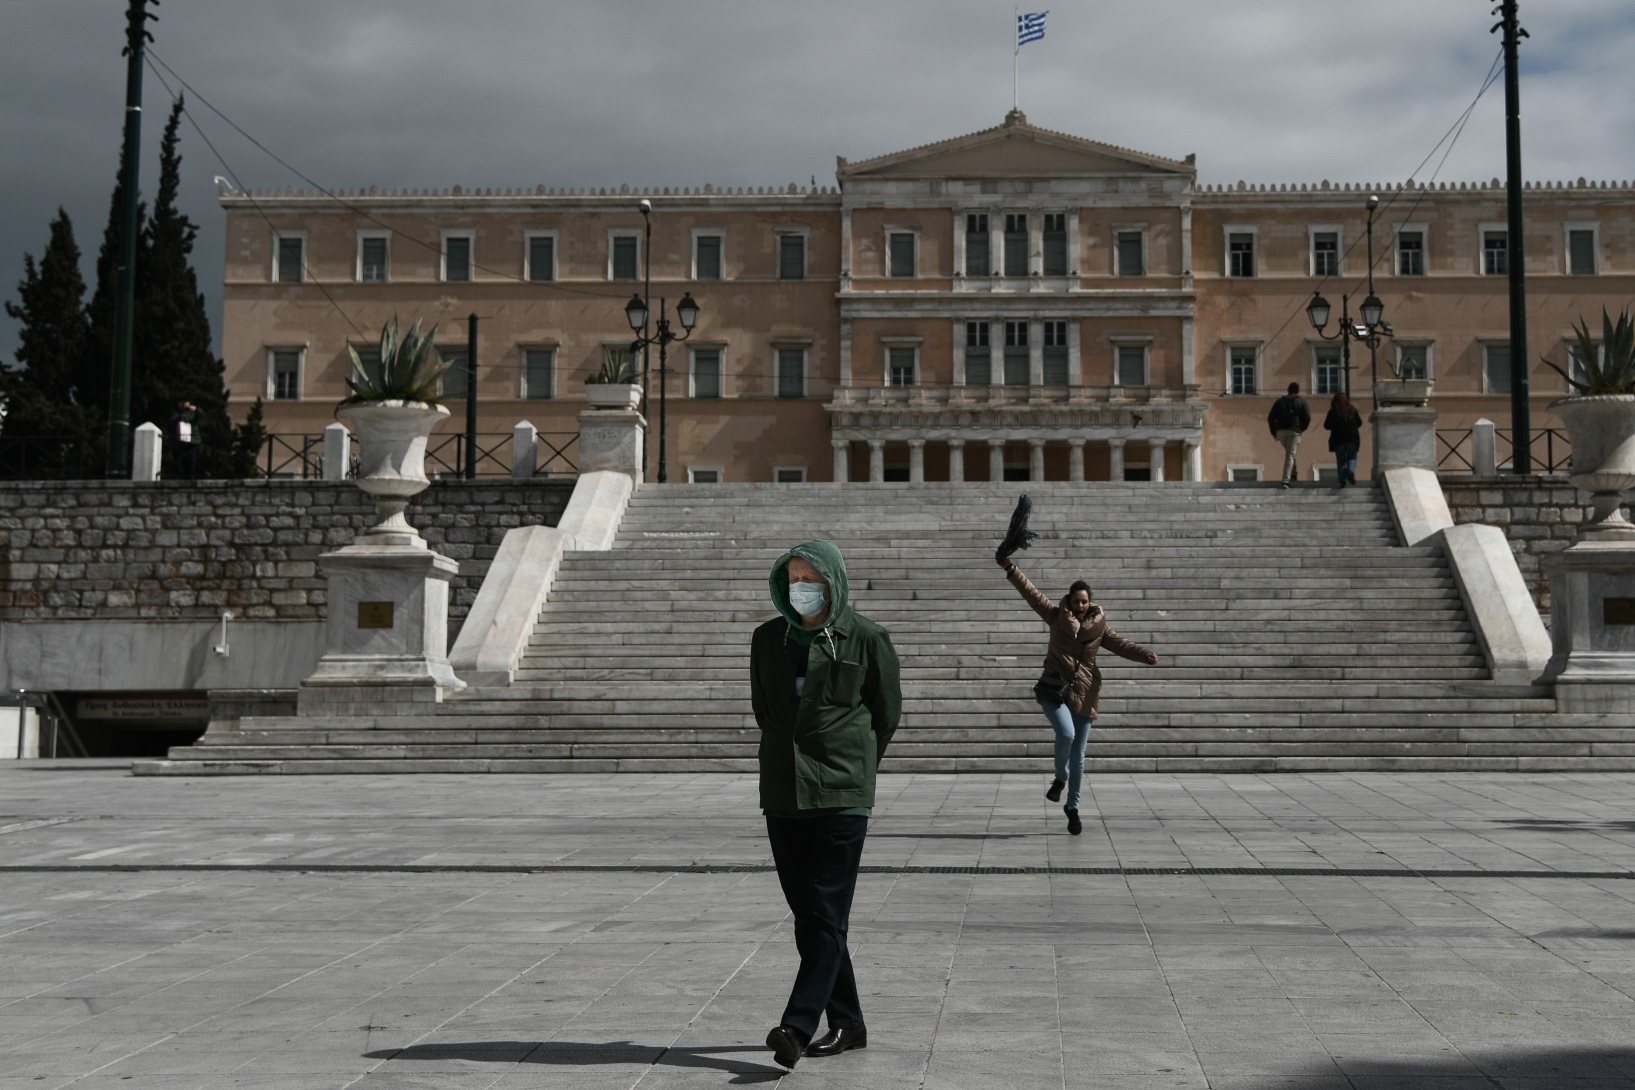 COVID 19: Γερμανικό Ινστιτούτο προβλέπει την πορεία του ιού στην Ελλάδα τις επόμενες 6 μέρες